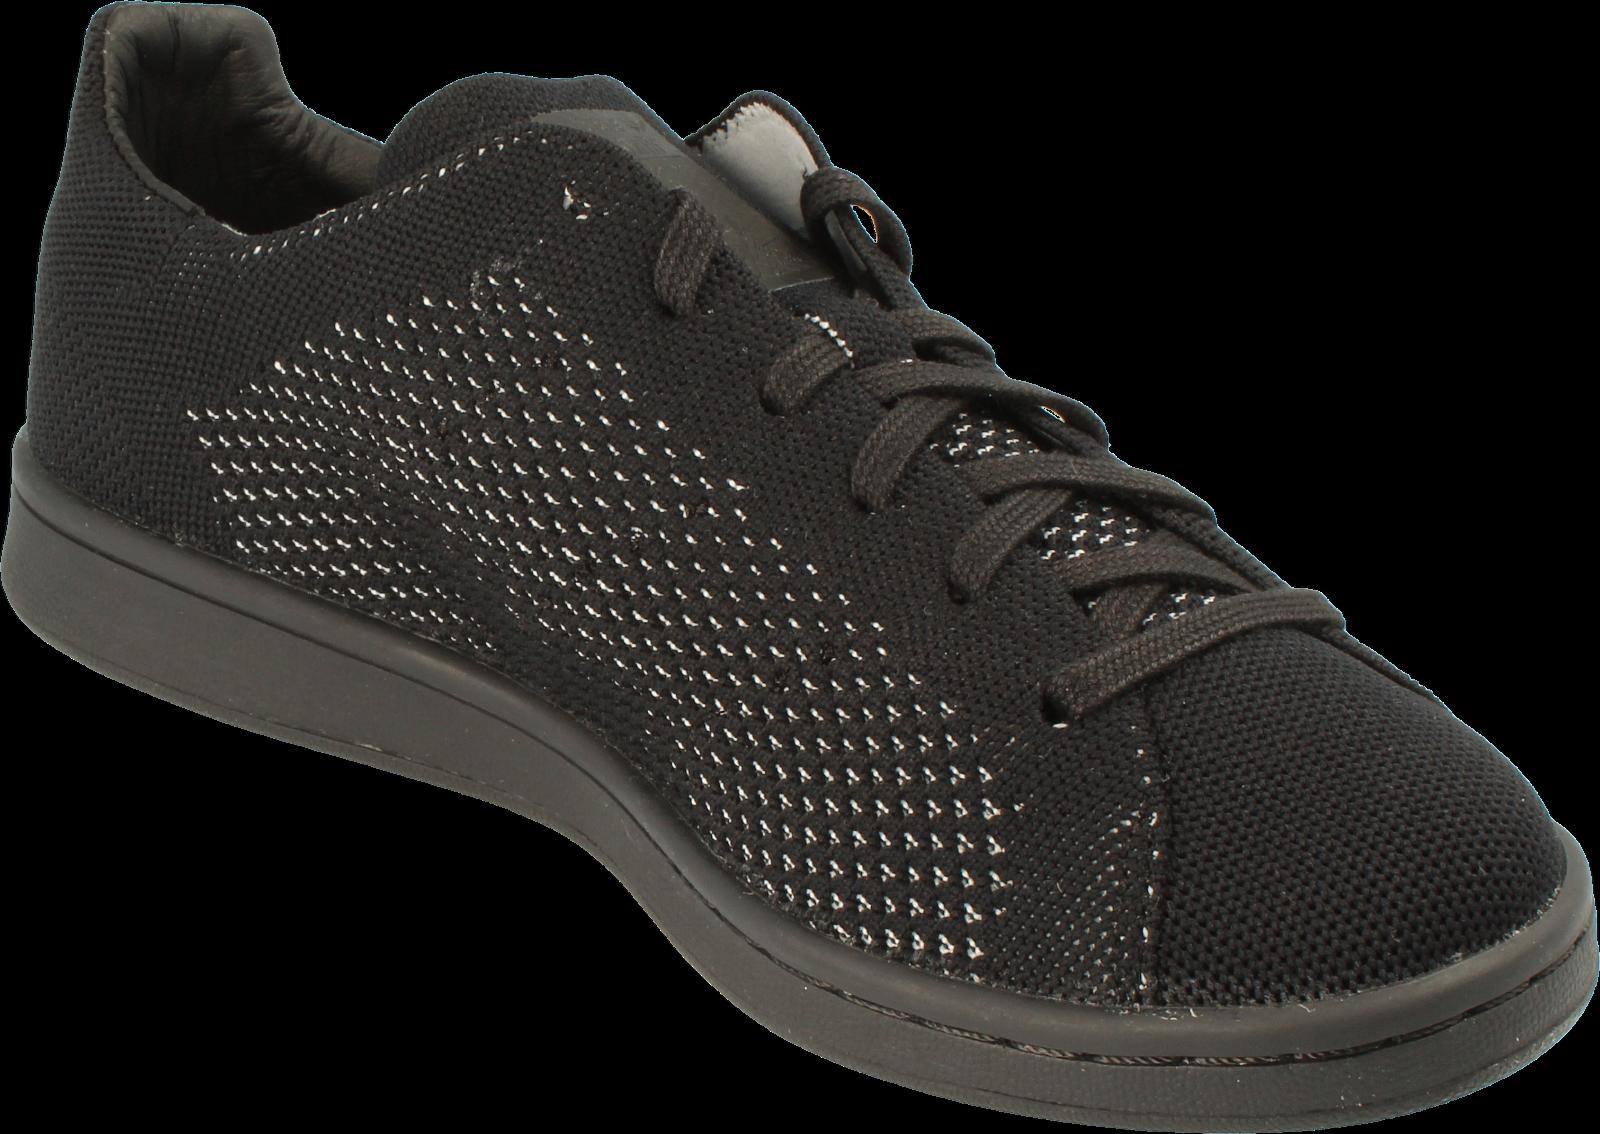 Adidas Originals Primeknit Stan Smith Og Pack Primeknit Originals S80065 Zapatillas Hombre 1633c2